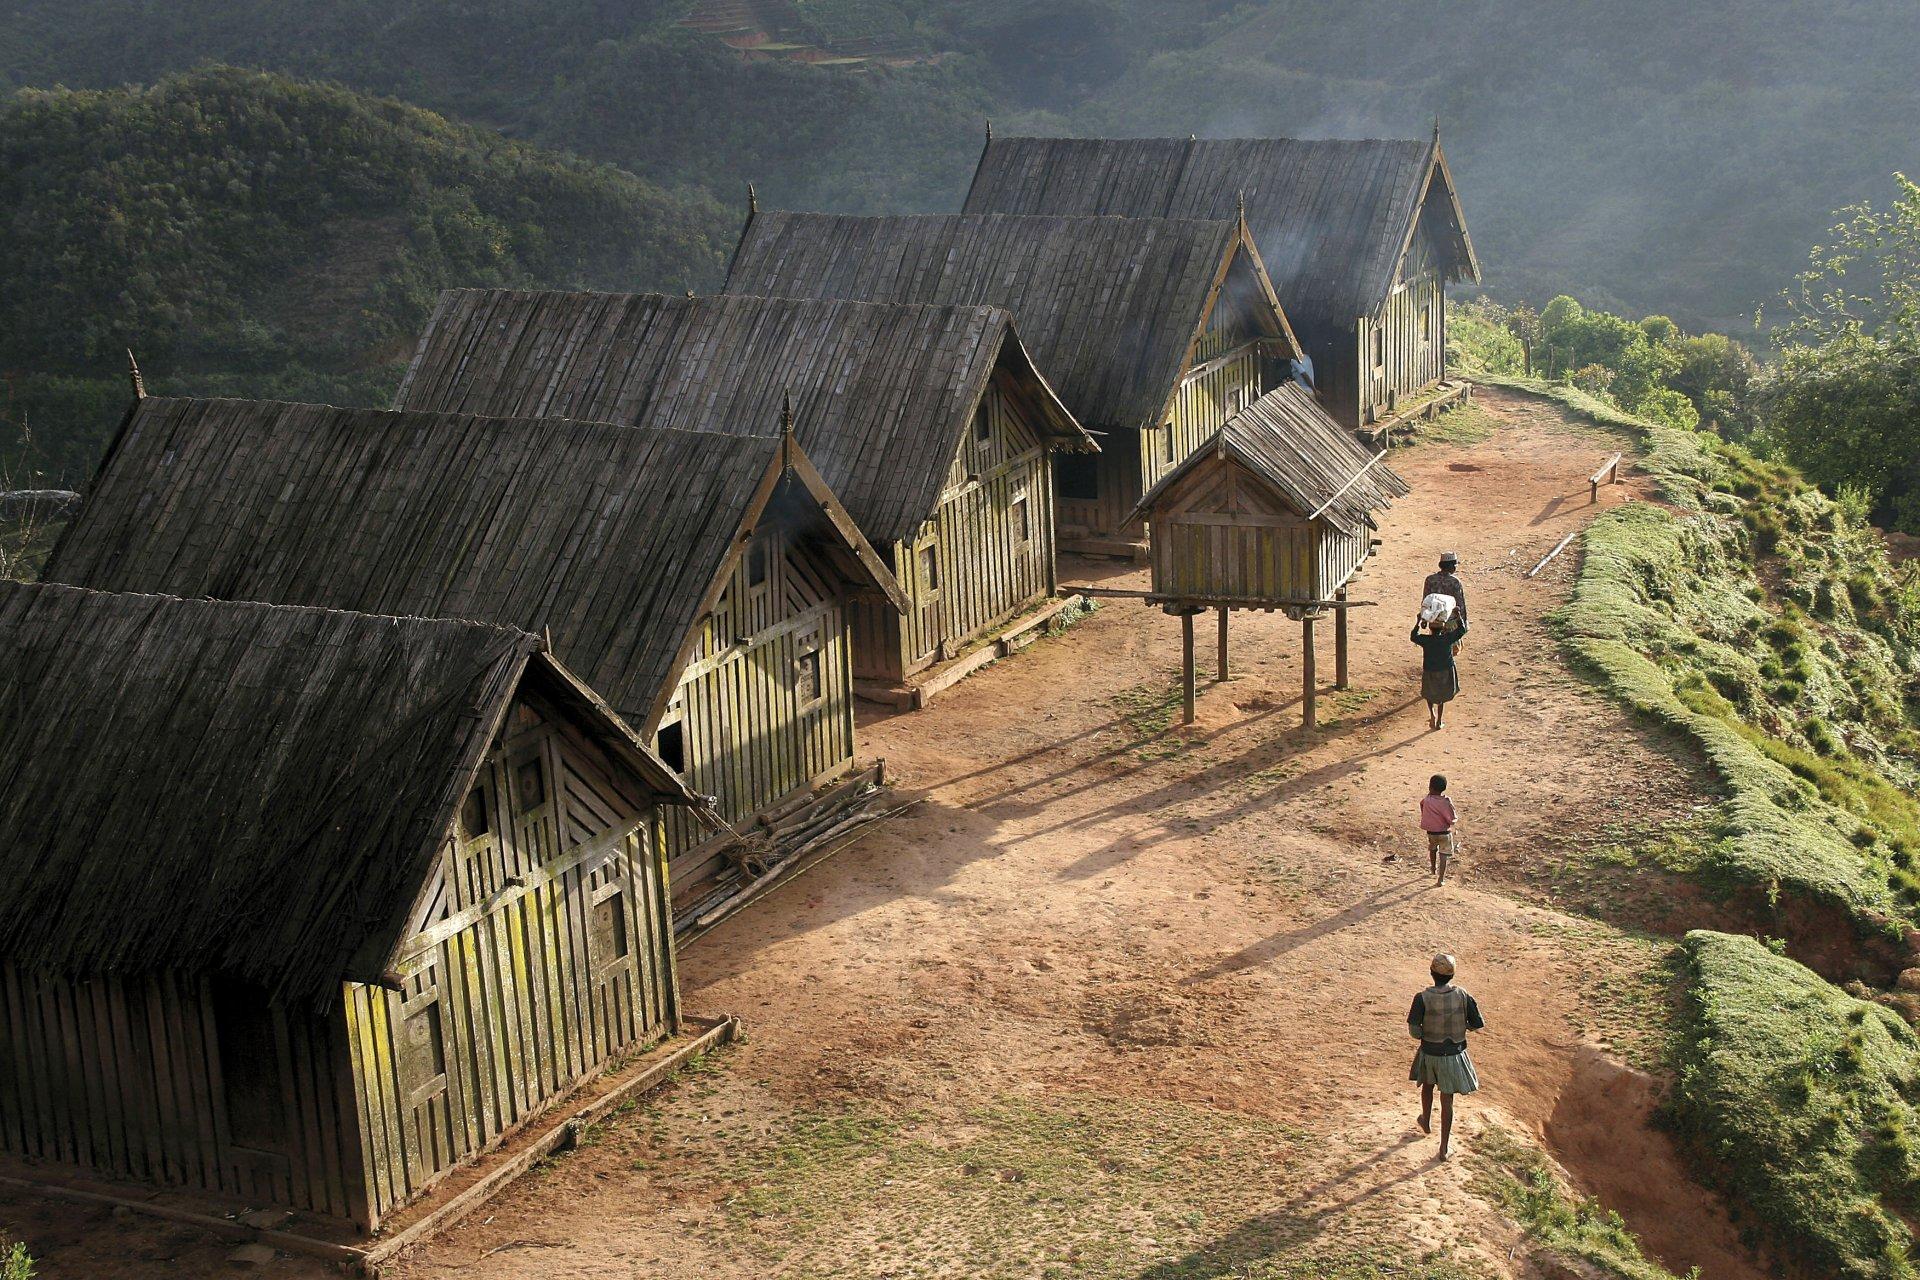 Pays zafimaniry - habitat